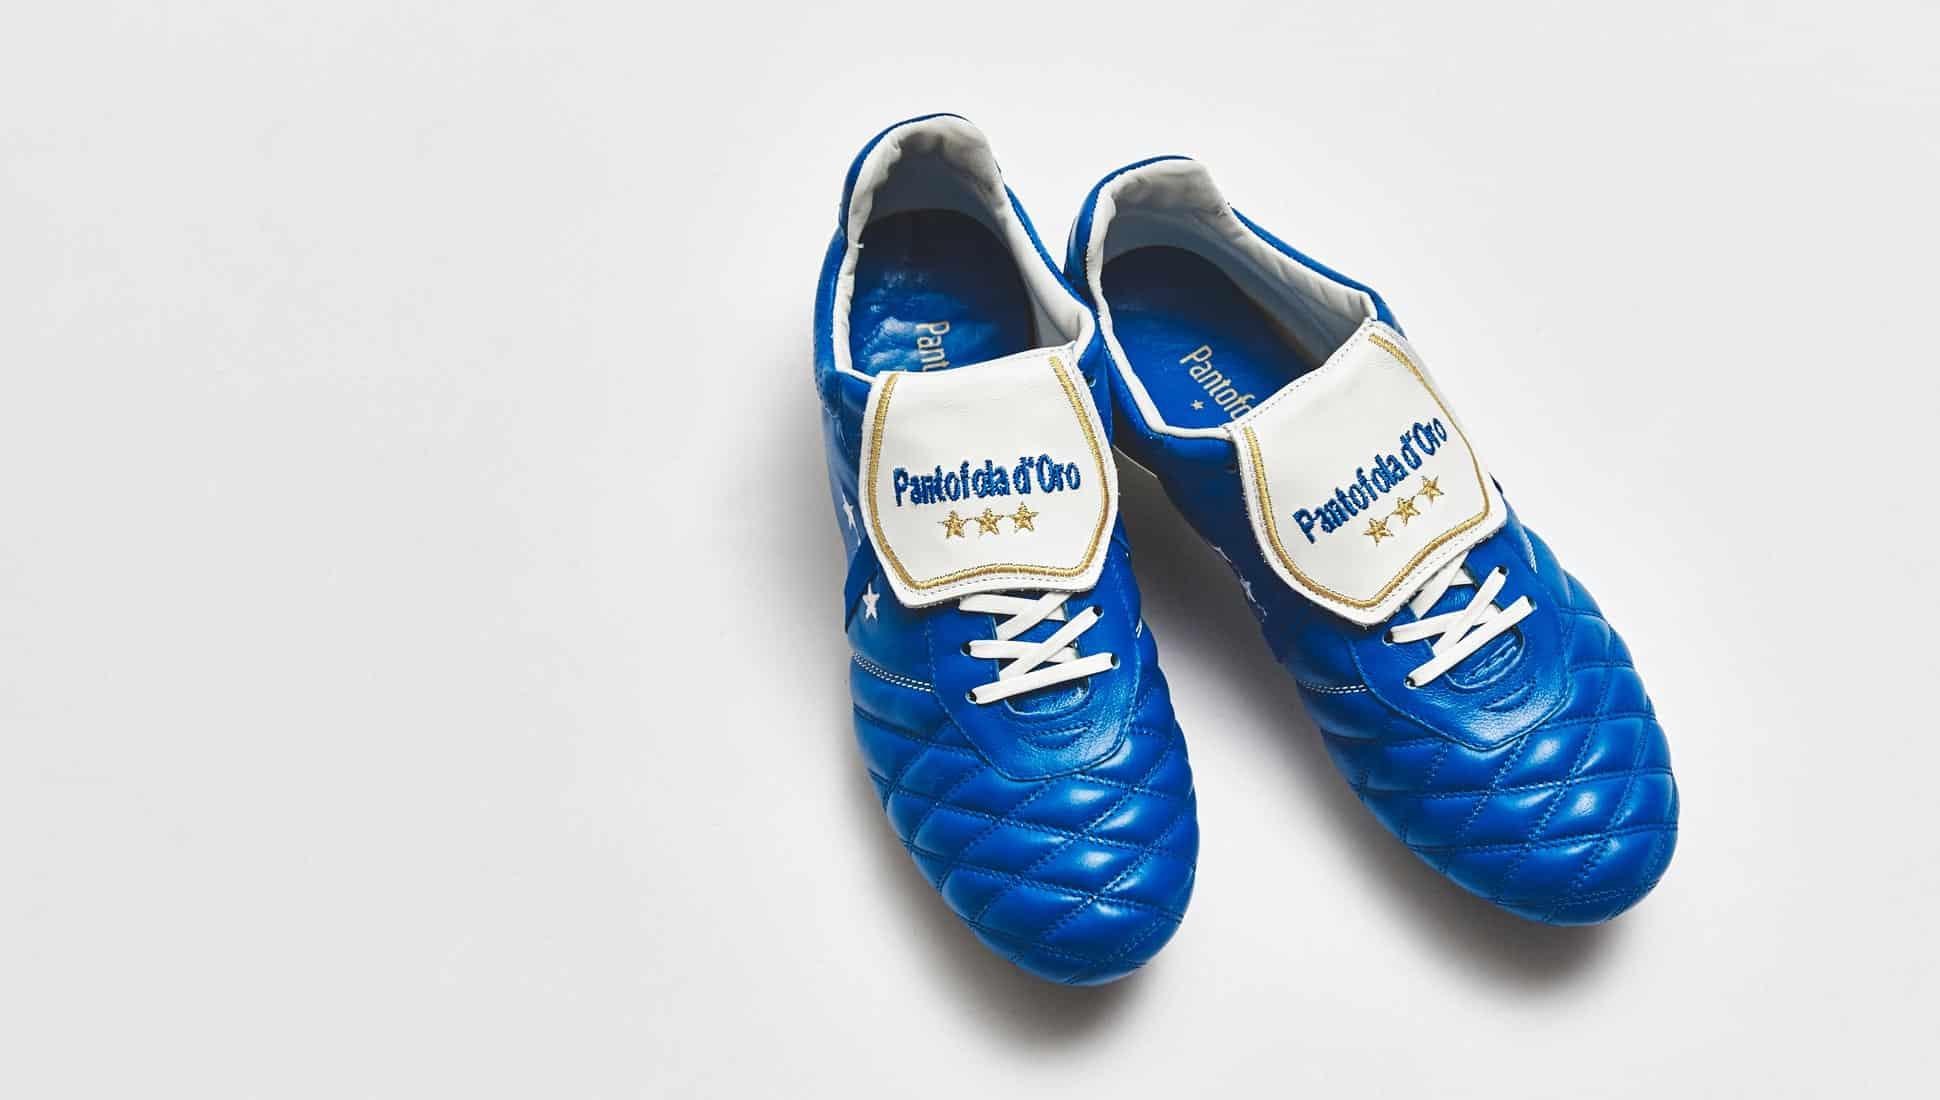 chaussures-football-pantofola-doro-emidio-italia-blue-1